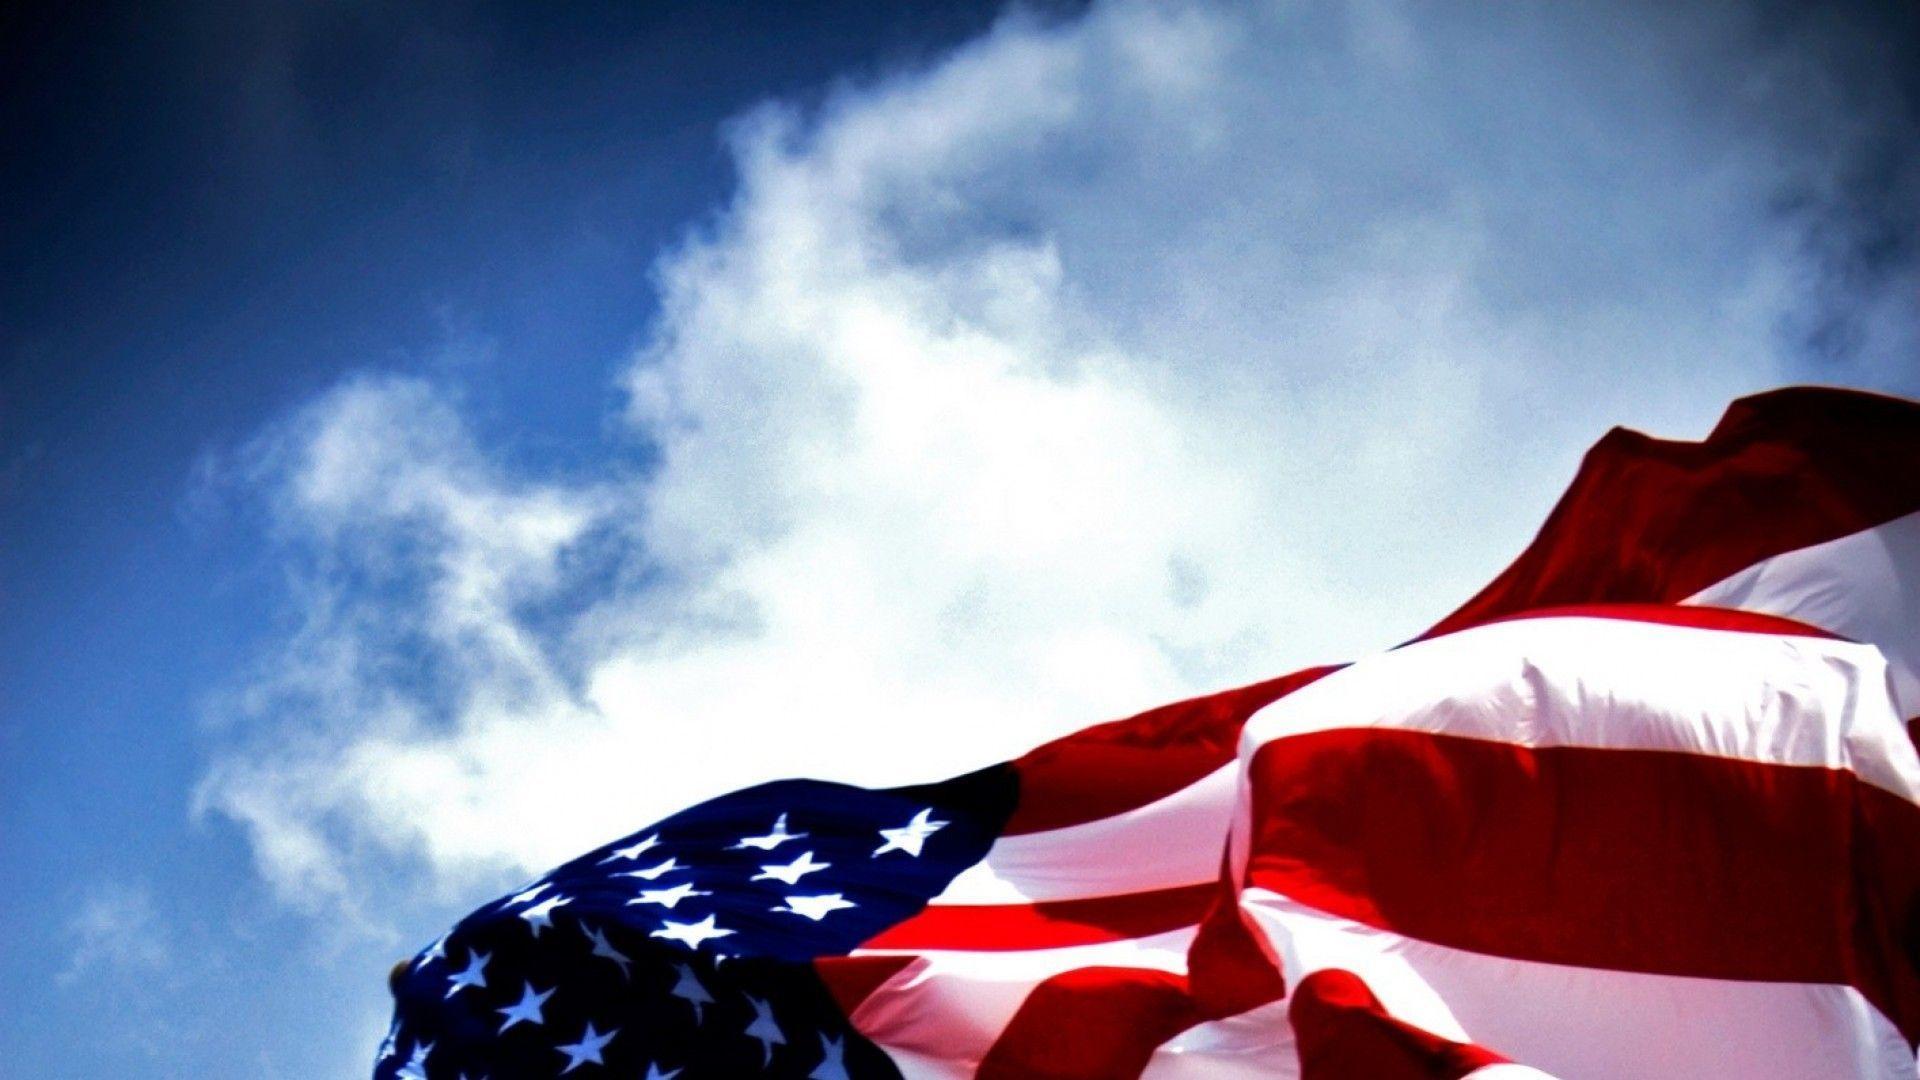 American Flag Desktop Backgrounds 1920x1080